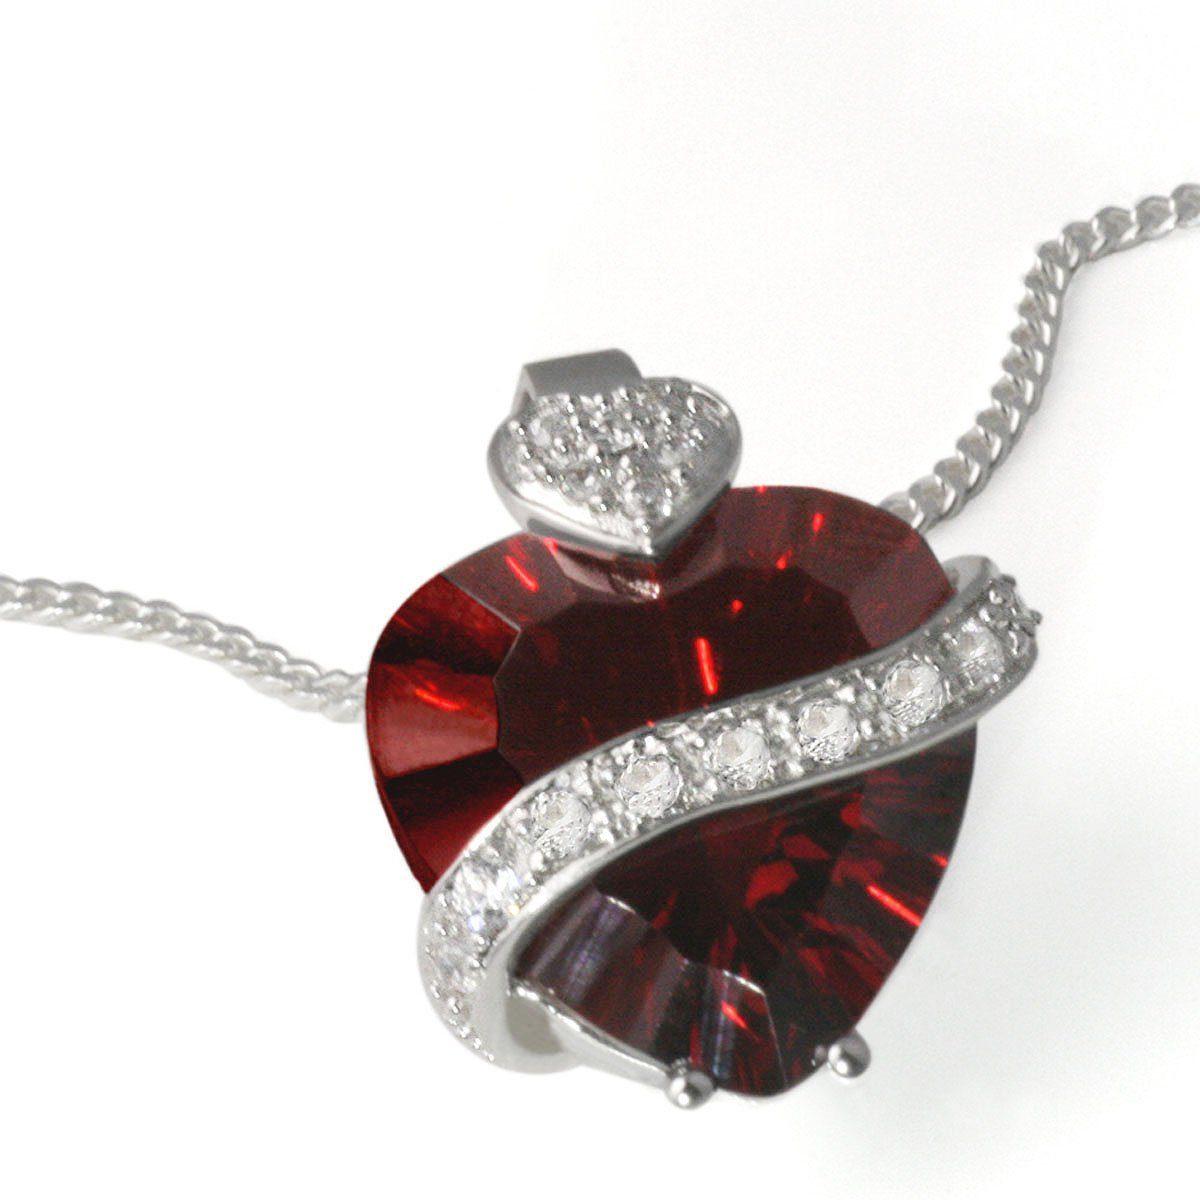 goldmaid Collier Silber 925 Herz im Milleniumcut granatfarbener Zirkonia